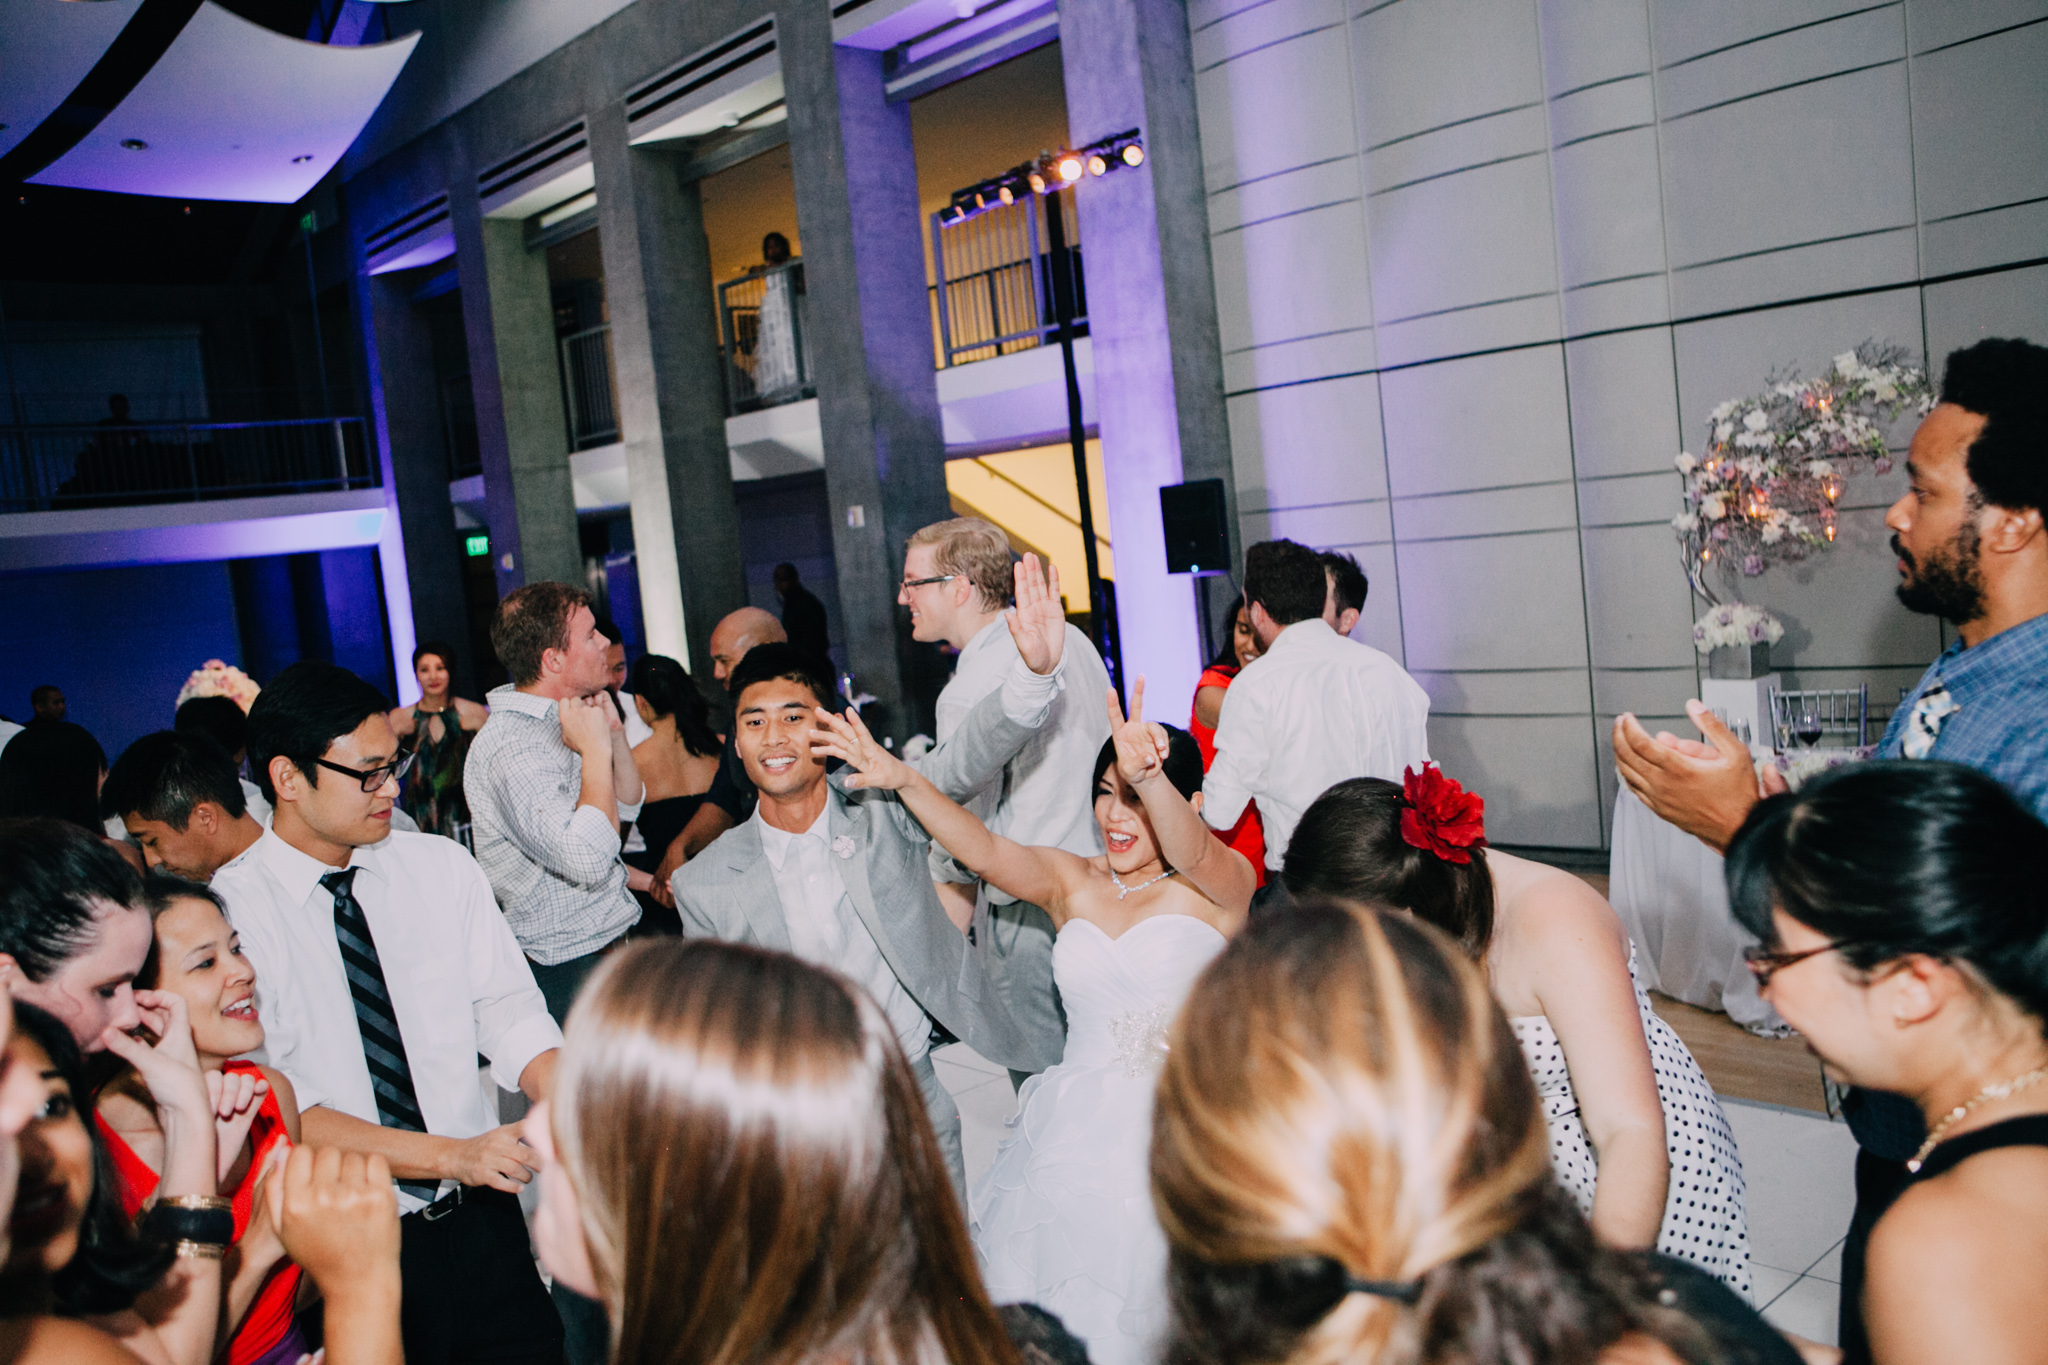 skirball cultural center wedding-157.jpg